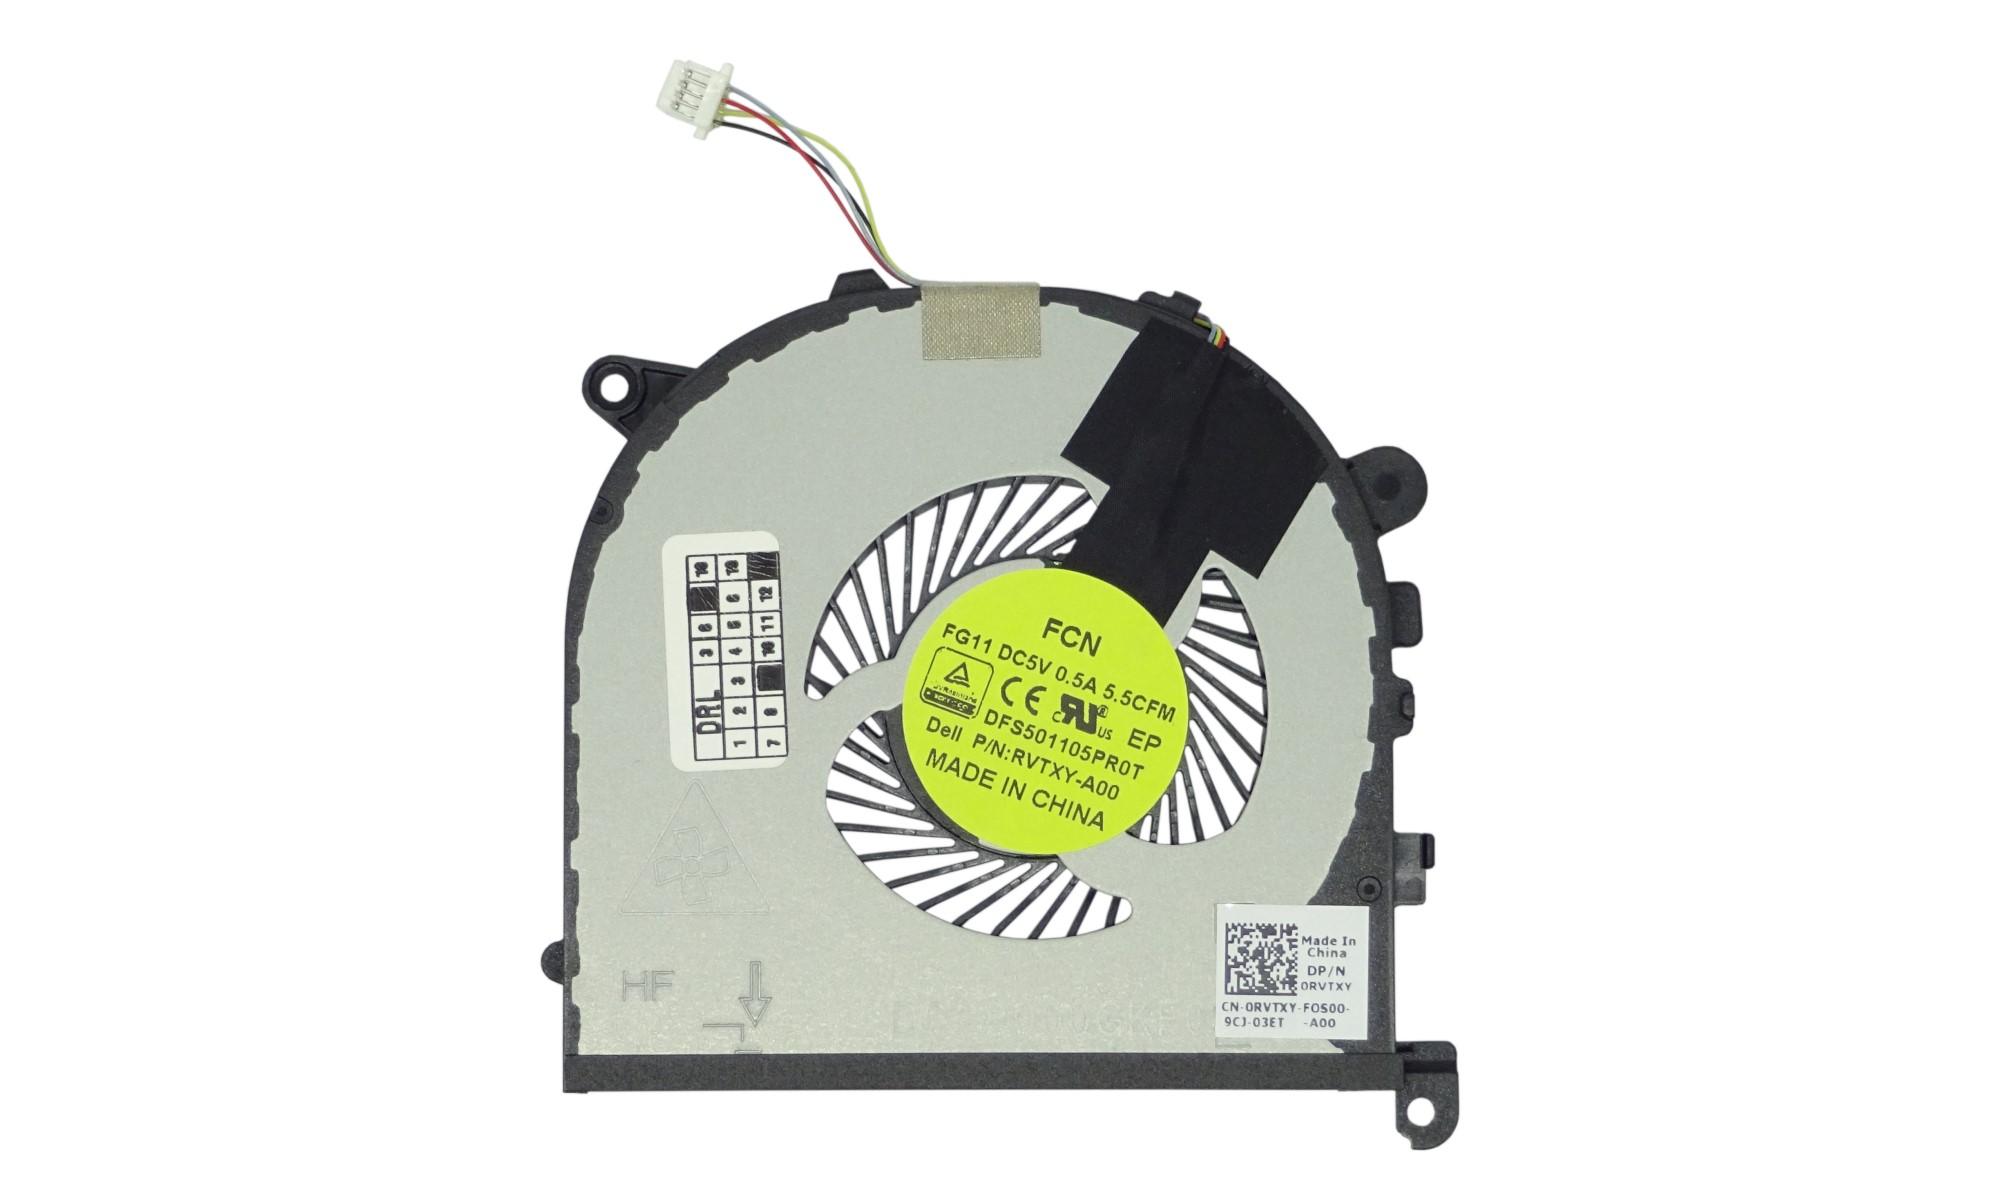 Cooler stanga pentru Dell Precision 15 5510, XPS 15 9550, model RVTXY DFS501105PR0T